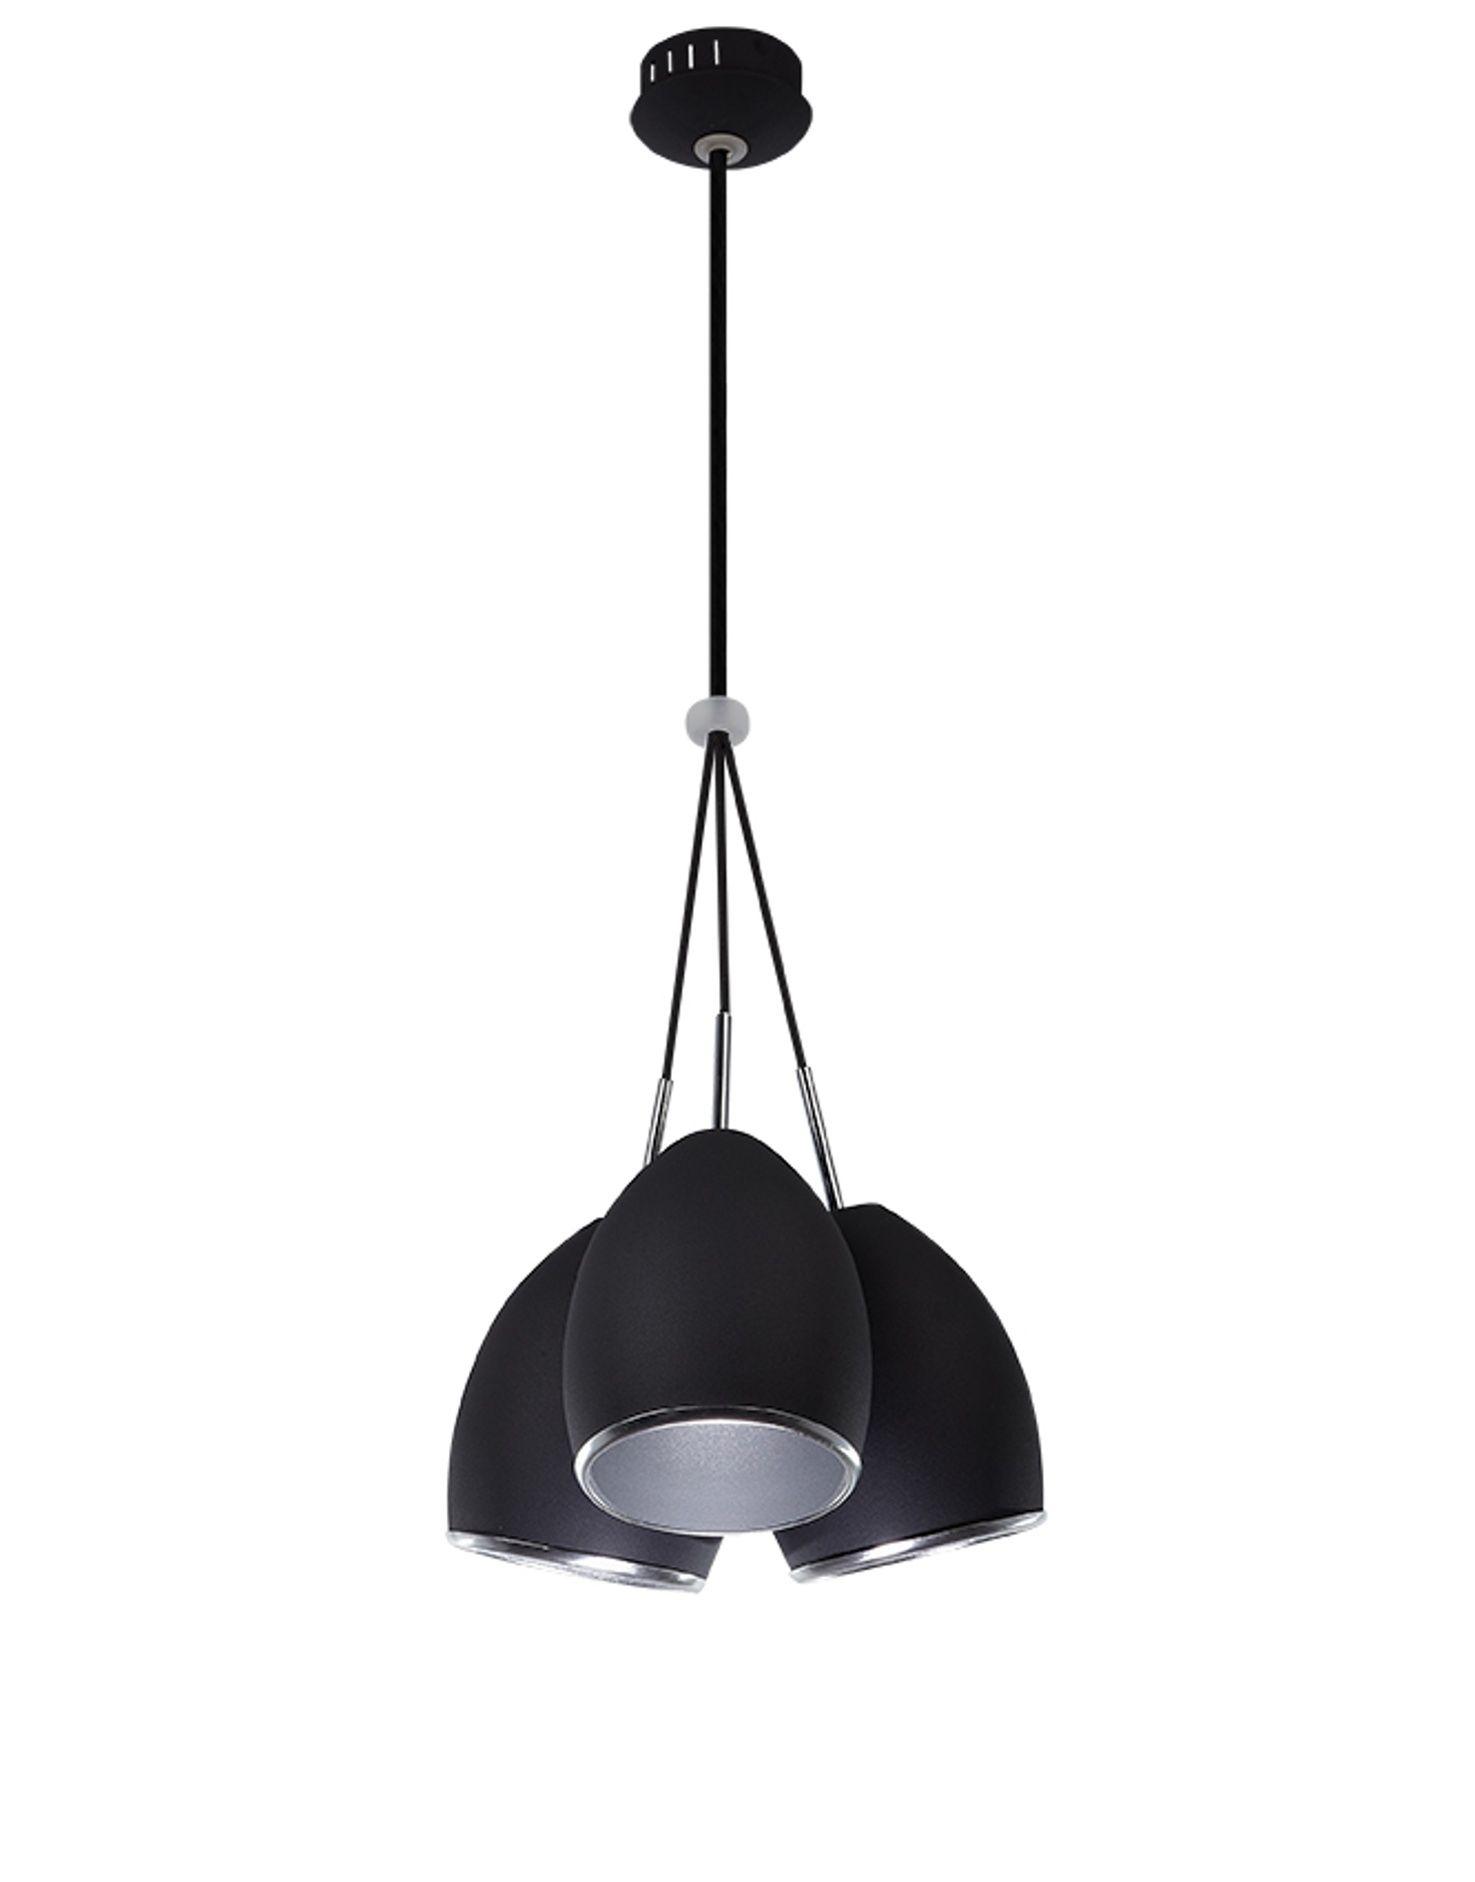 Piccolo | Pendant lighting, Ceiling lights, Pendant light